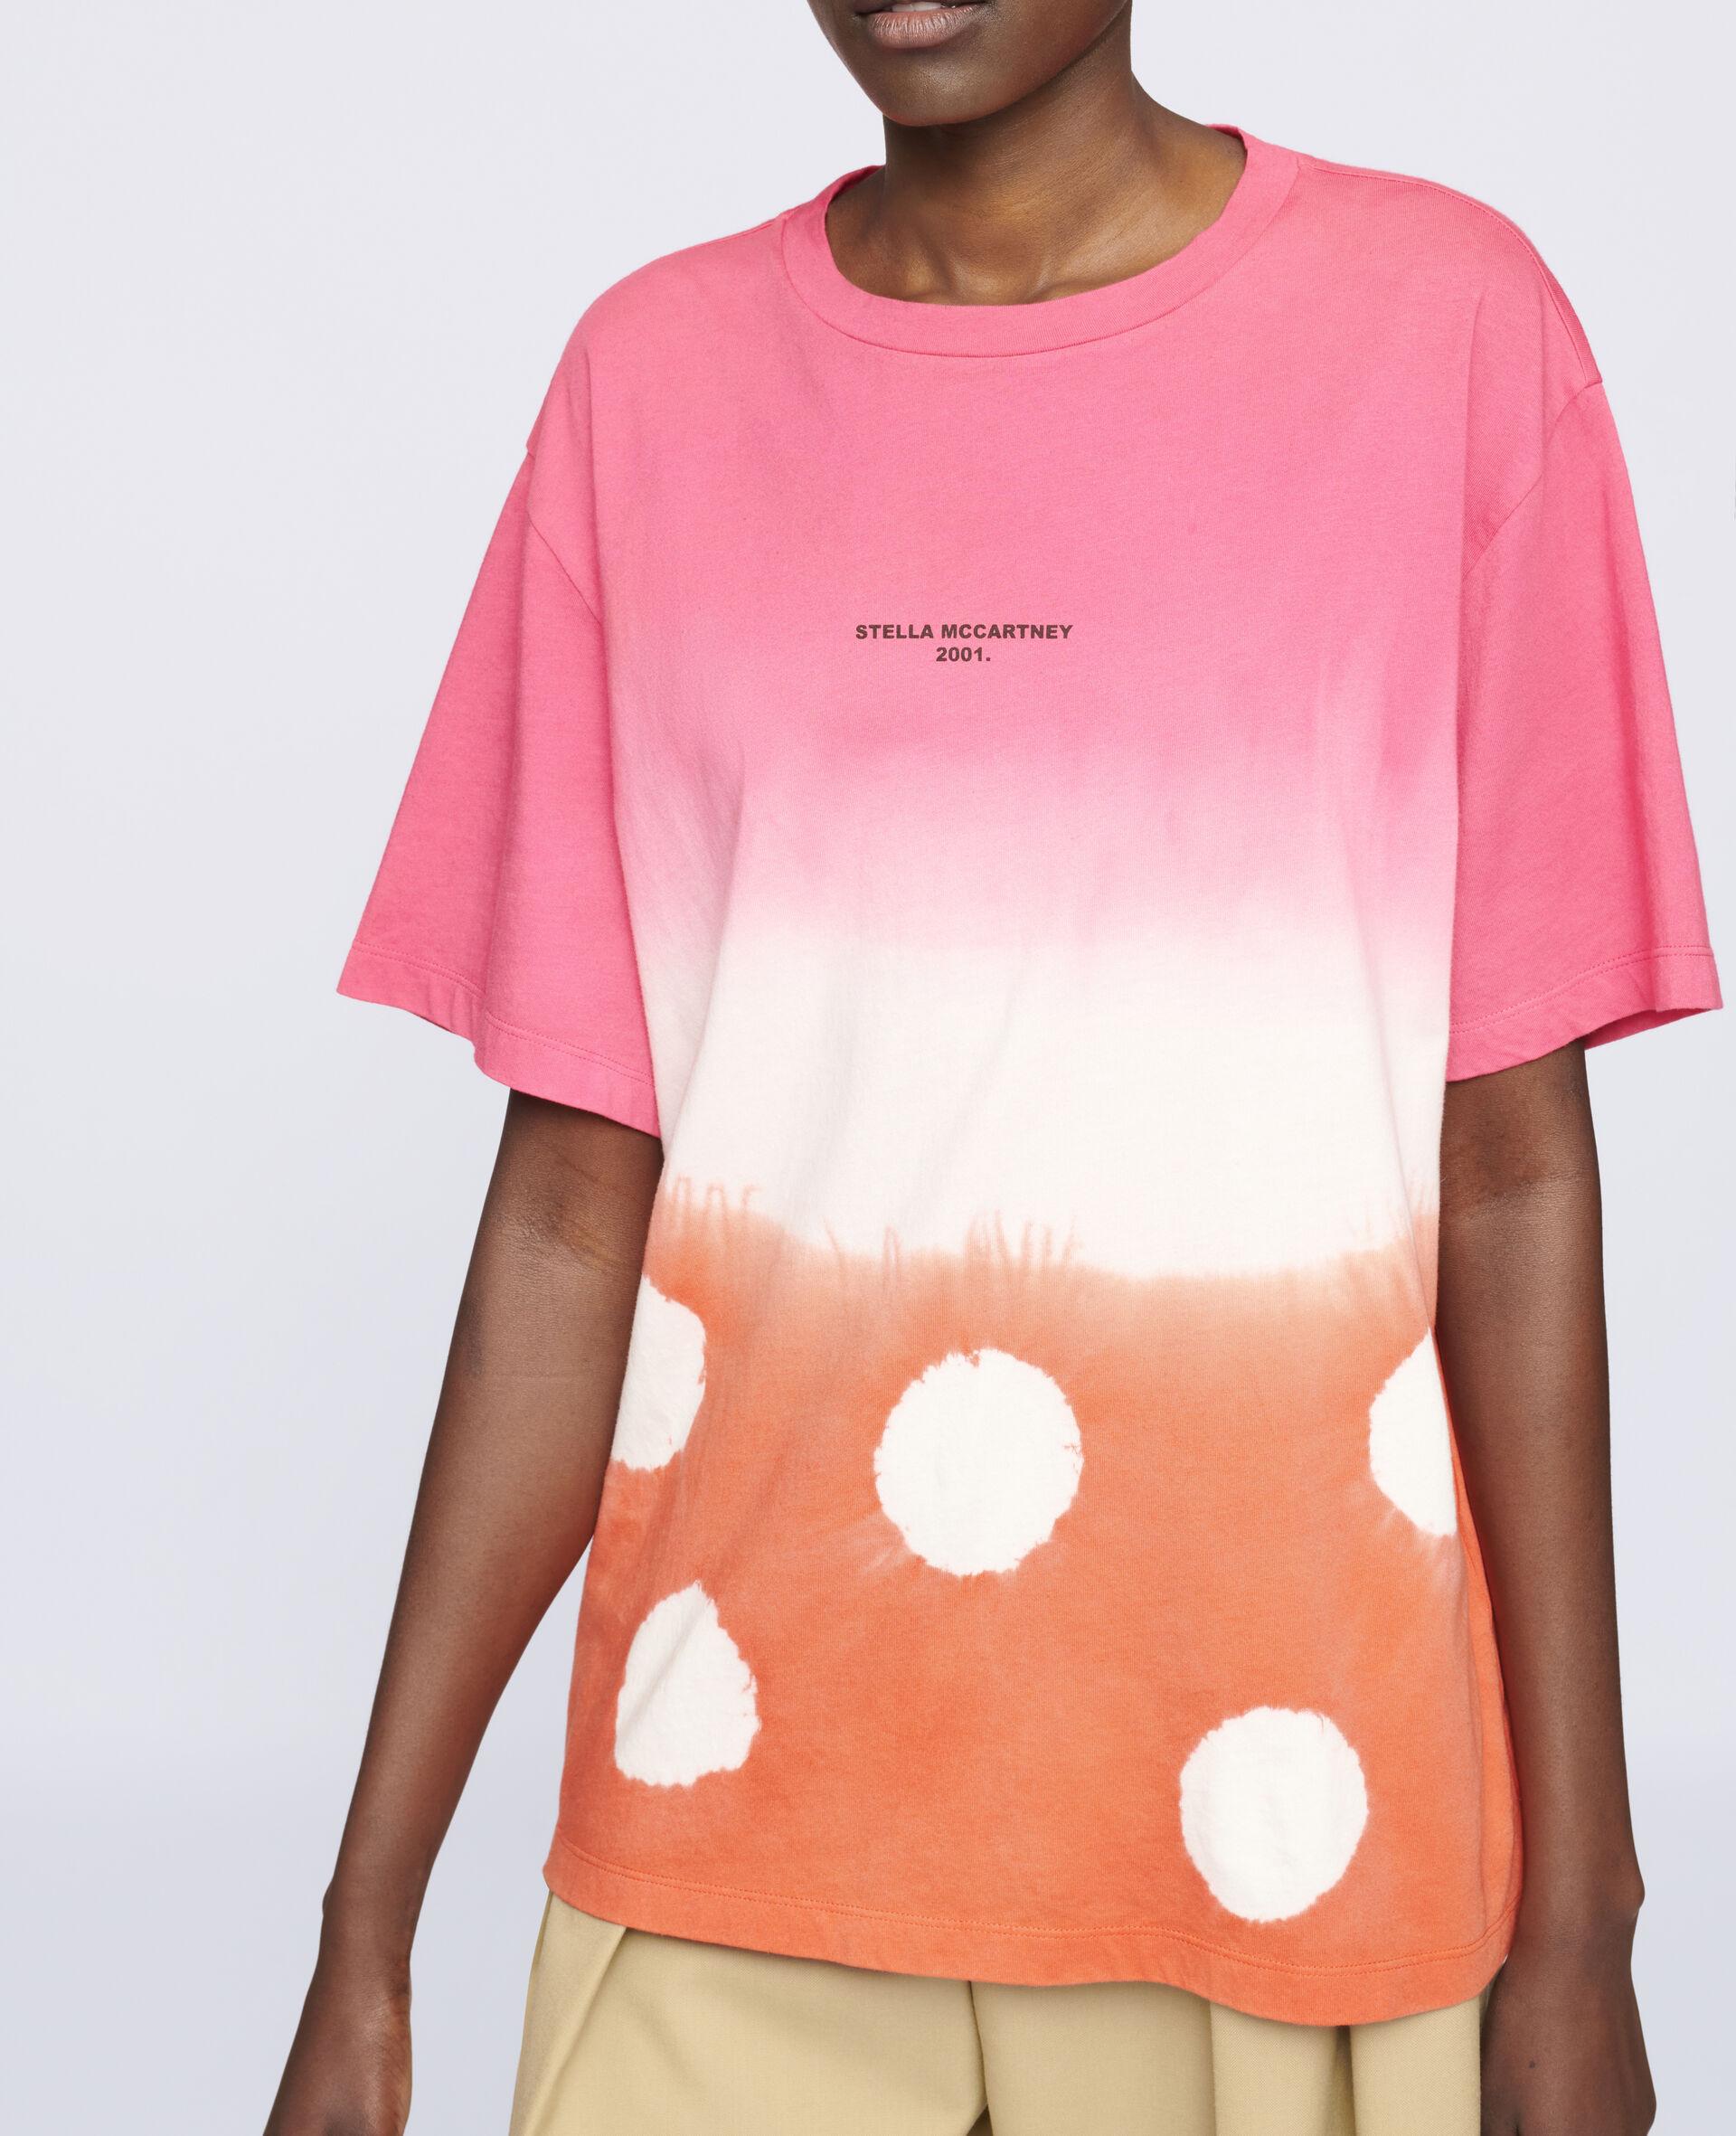 'Stella McCartney 2001.' Tie-Dye T-Shirt-Multicolour-large image number 3